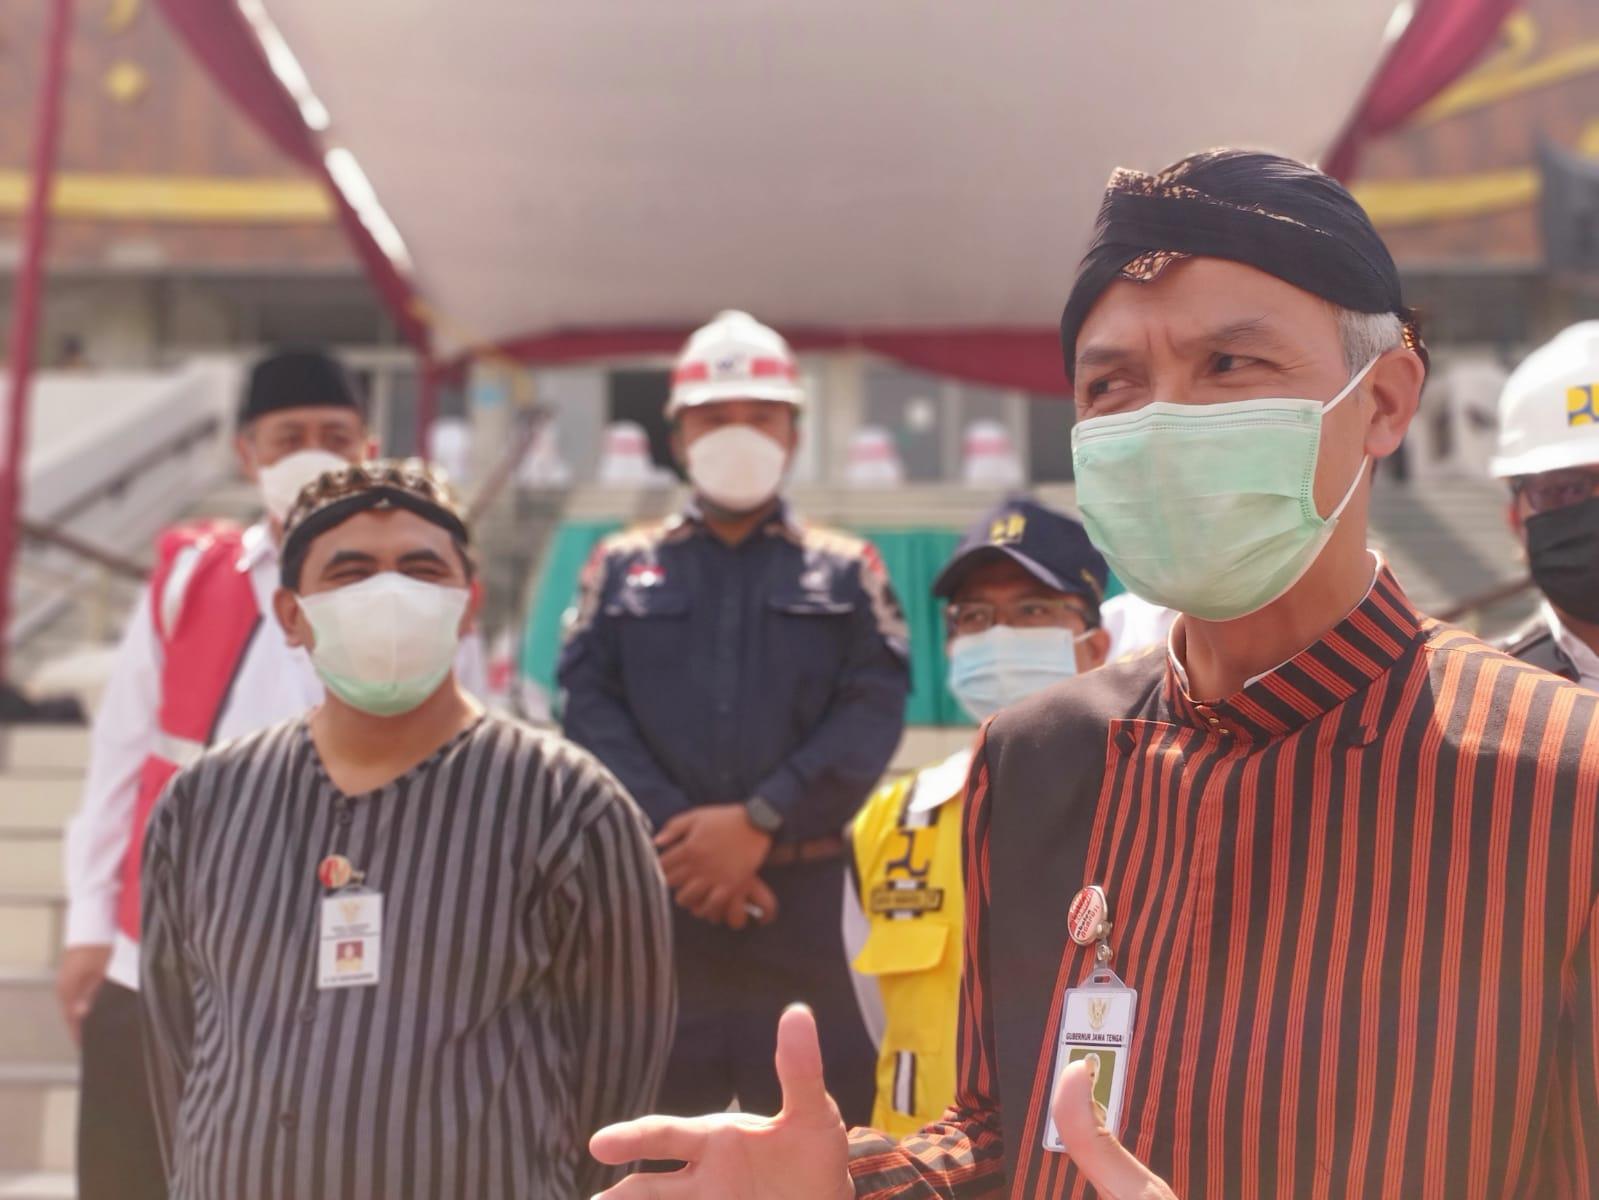 Gubernur Jateng, Ganjar Pranowo, usai seremonial renovasi dan penataan Masjid Baiturrahman Semarang, Kamis (2/9/2021). FOTO: Rezanda Akbar D/Lingkar.co